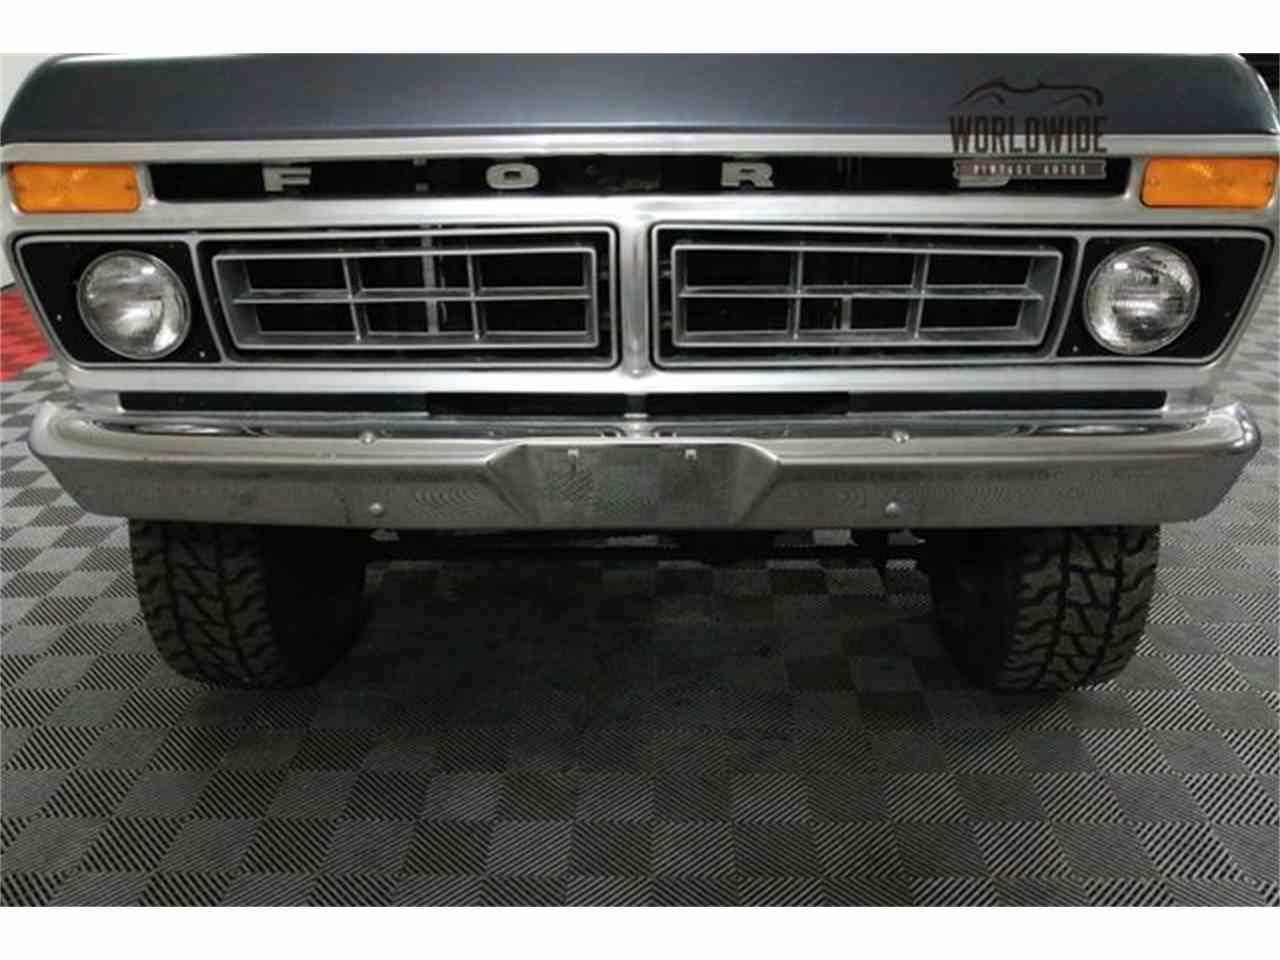 1977 Ford F150 for Sale | ClassicCars.com | CC-1069476